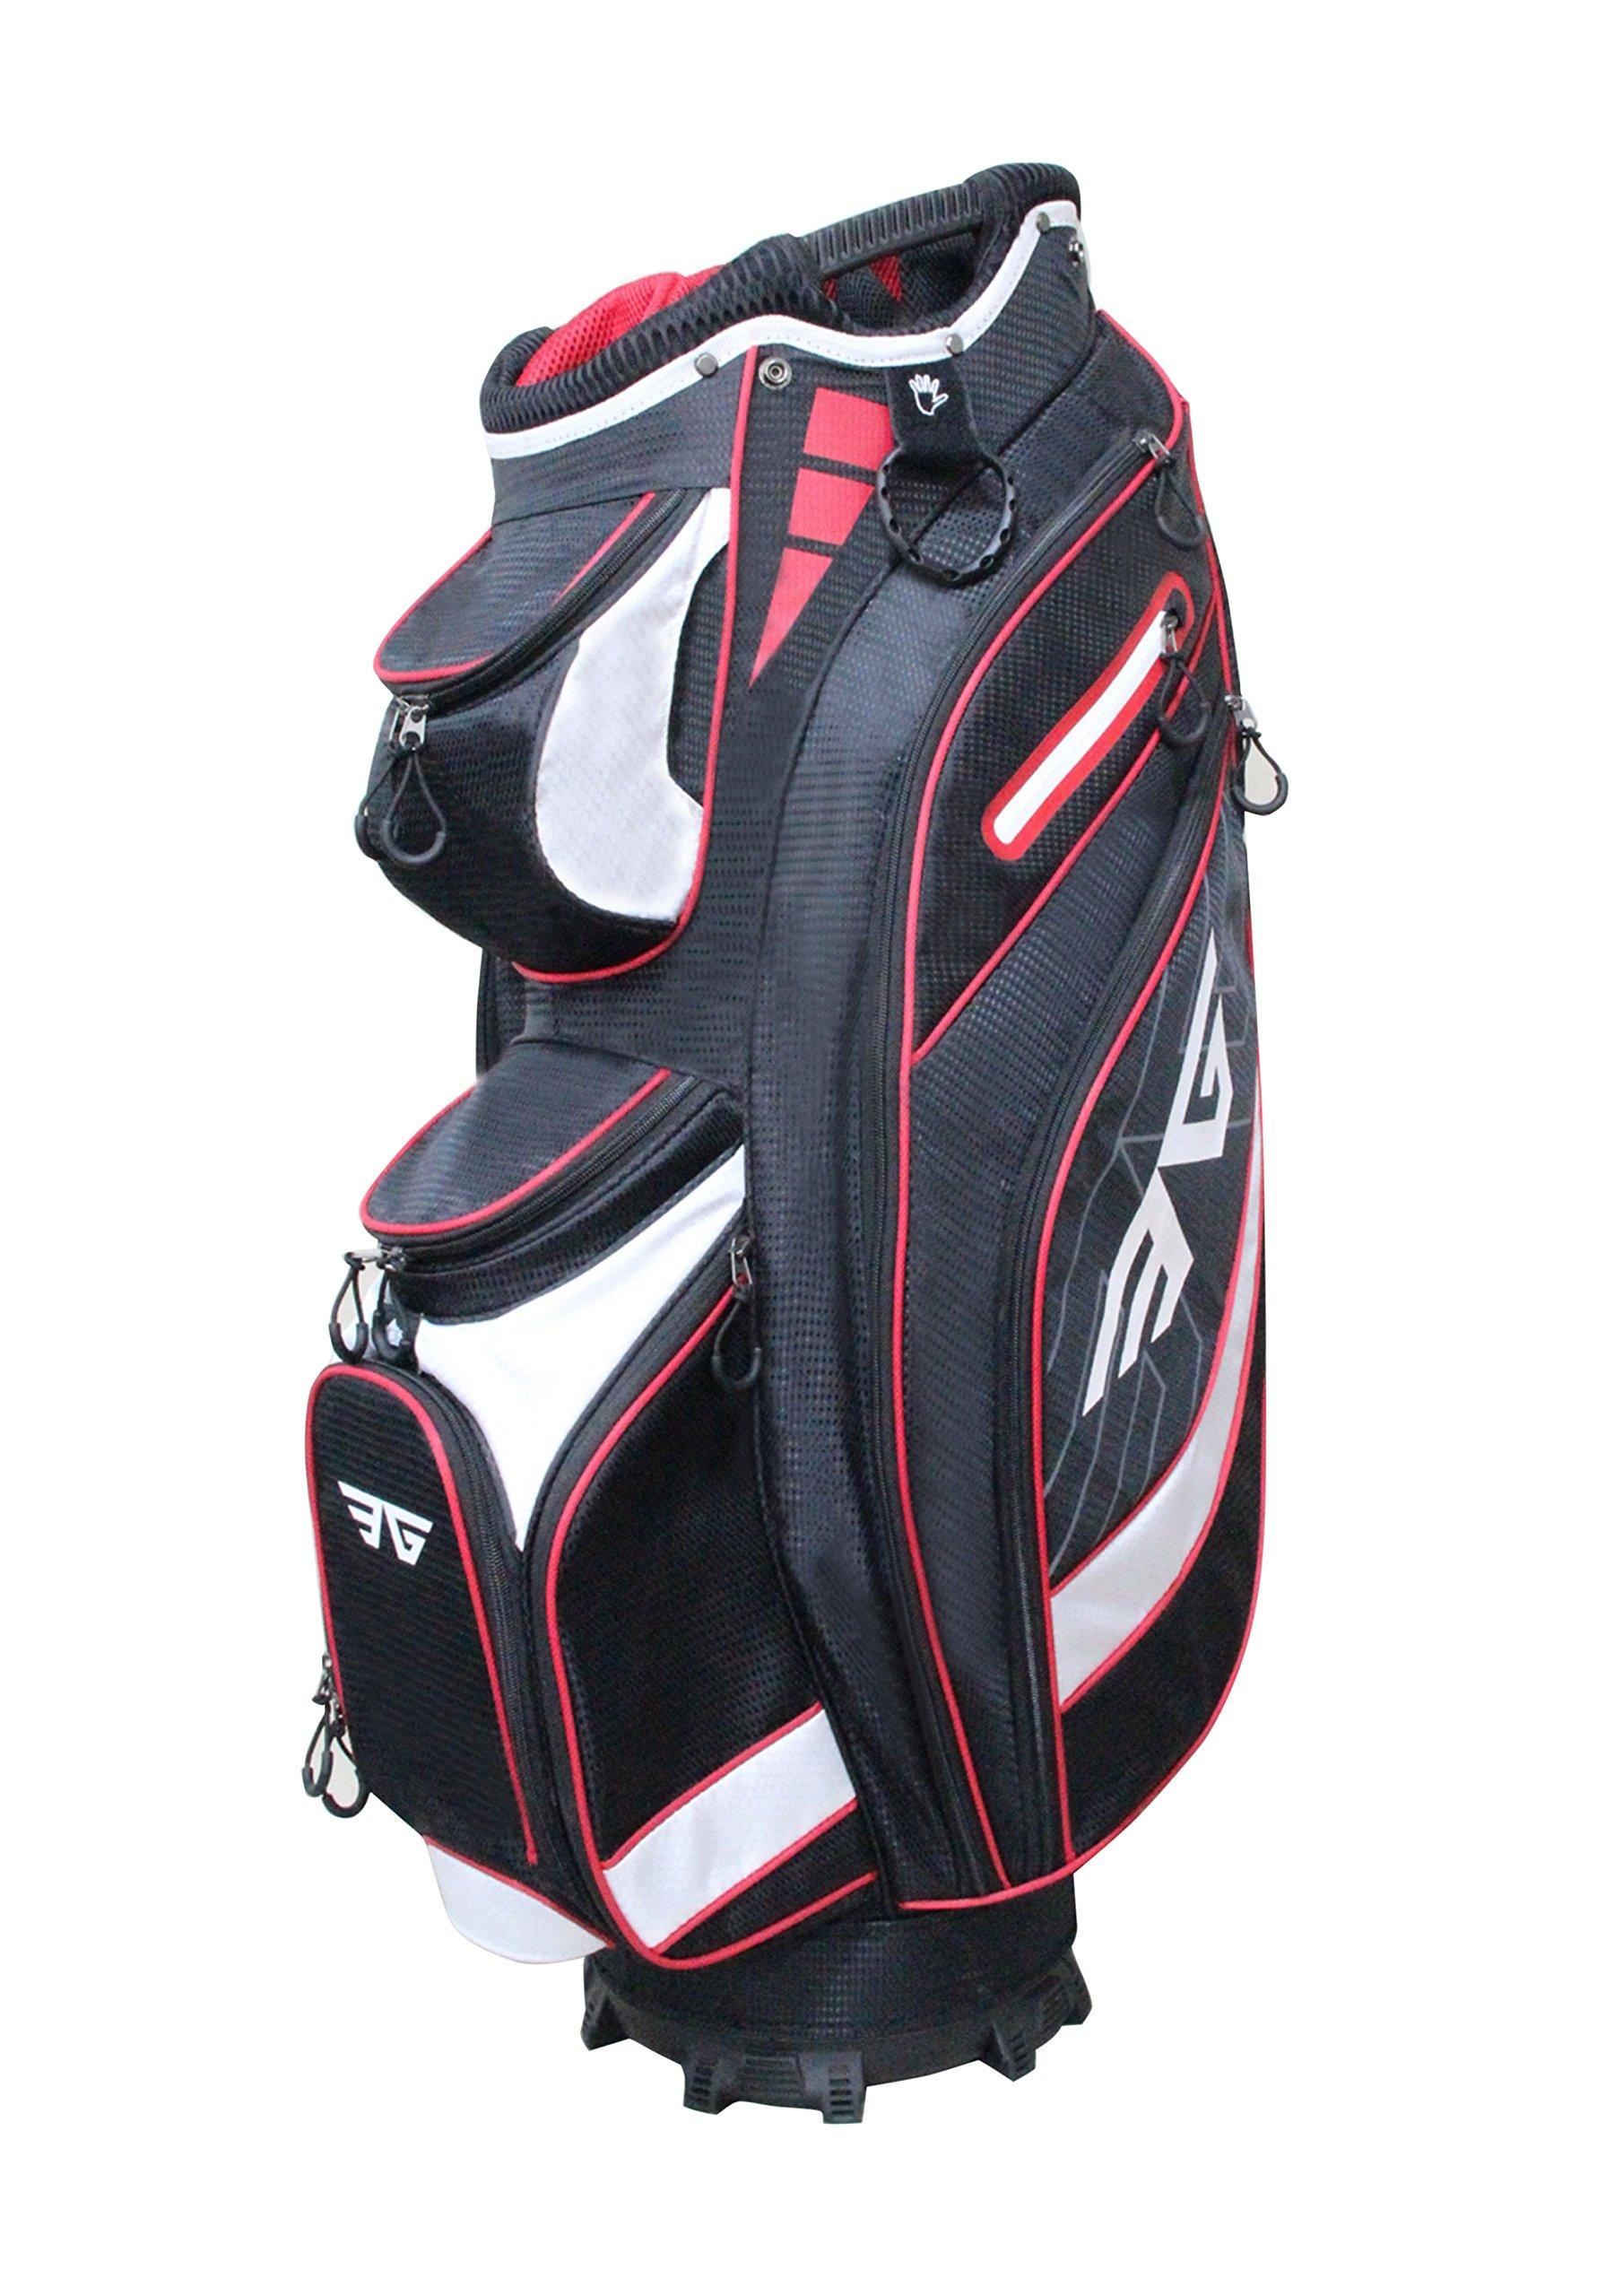 932d3e78a96e Cheap Full Length Divider Golf Bags, find Full Length Divider Golf ...